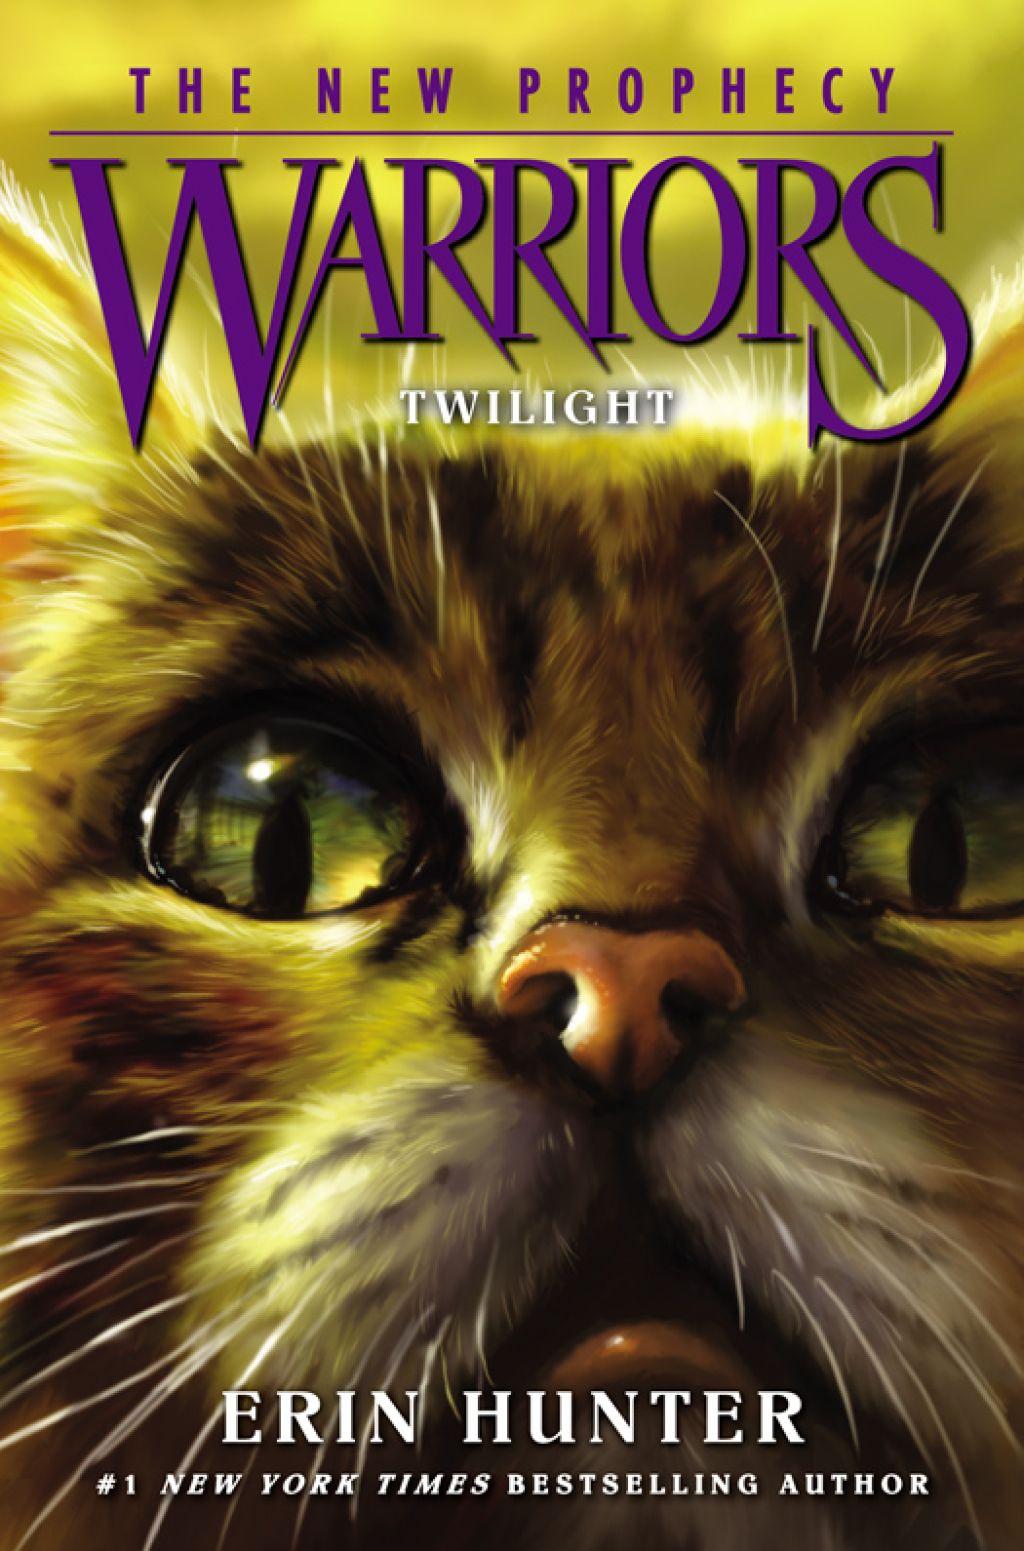 Warriors The New Prophecy 5 Twilight (eBook) Warrior